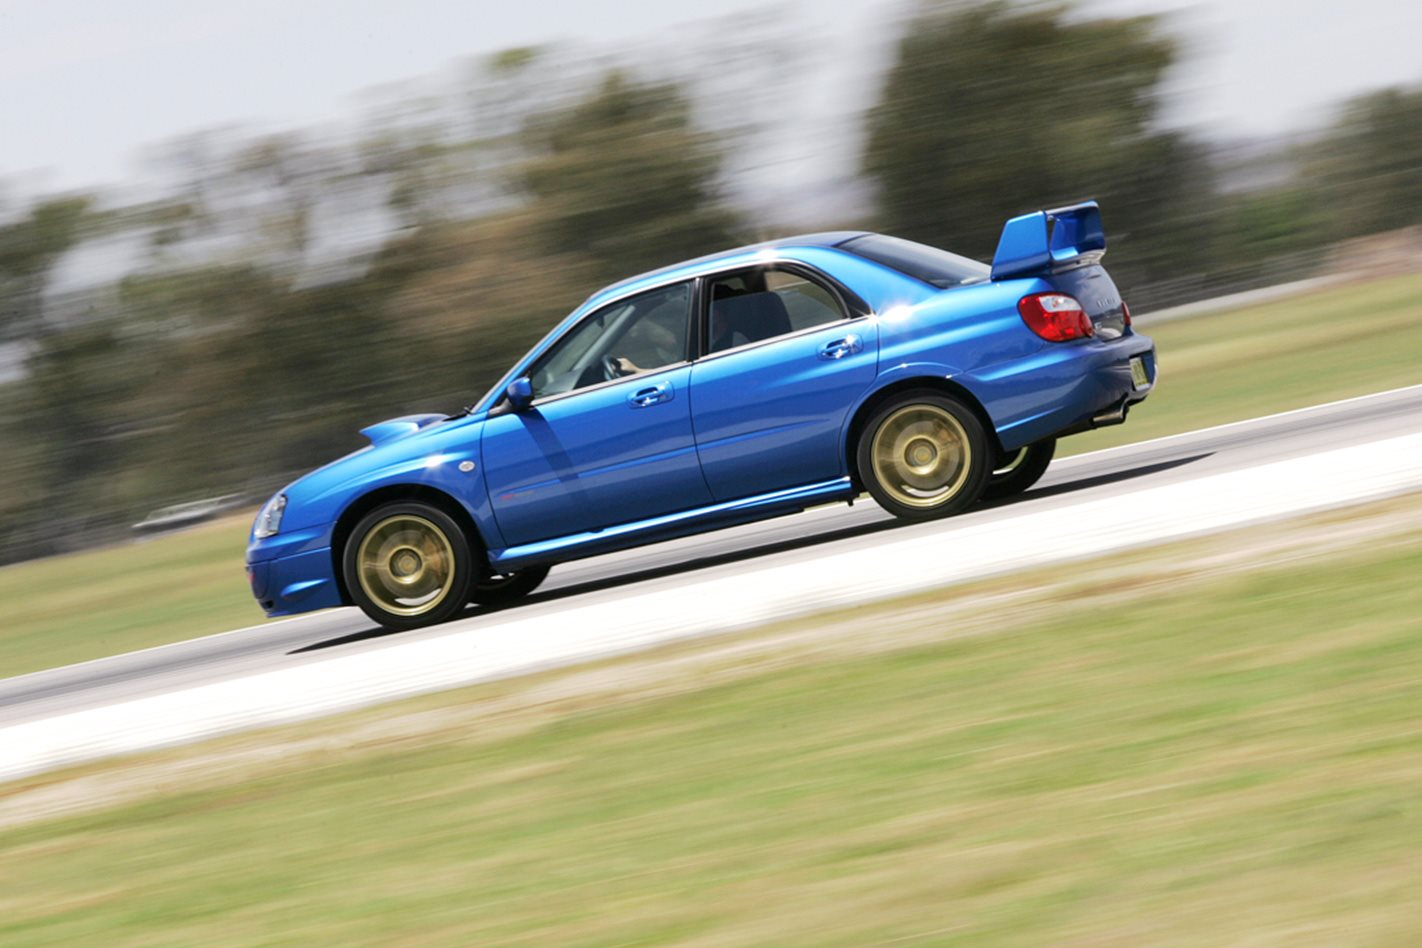 2004-Subaru-Impreza-WRX-STi.jpg